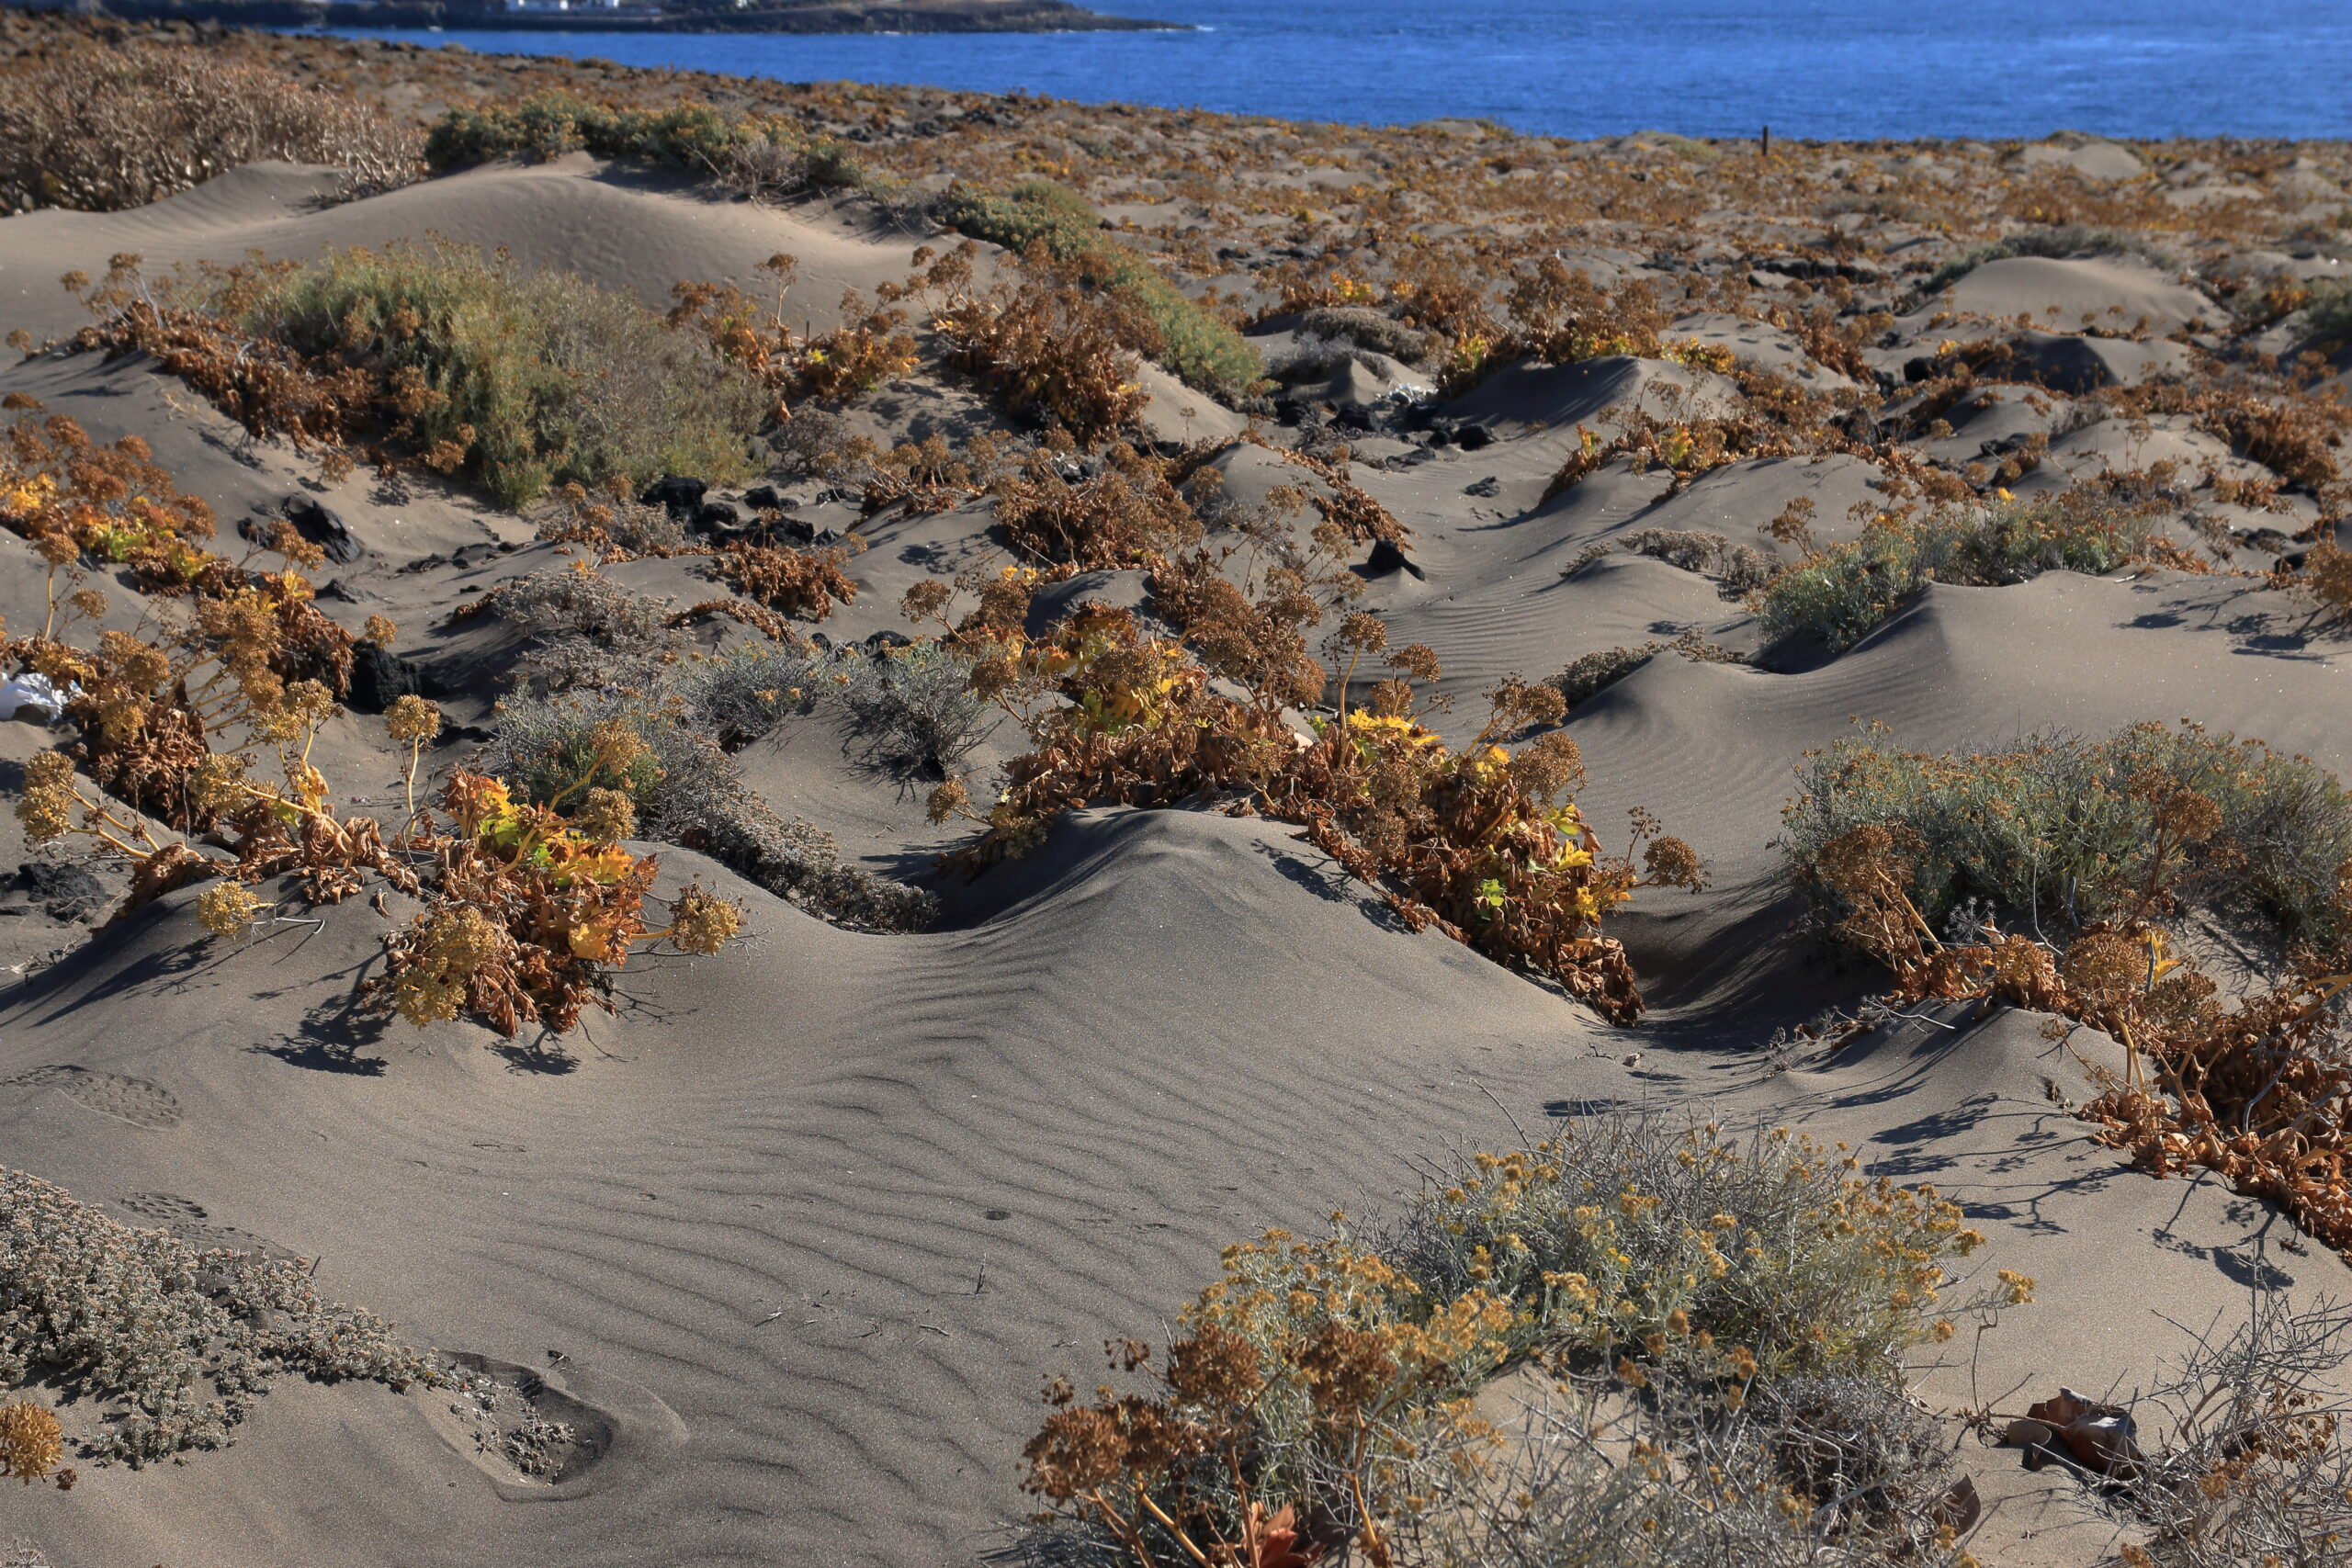 img_7061-dunas-arena-con-vegetacion-halofila-2-scaled.jpg